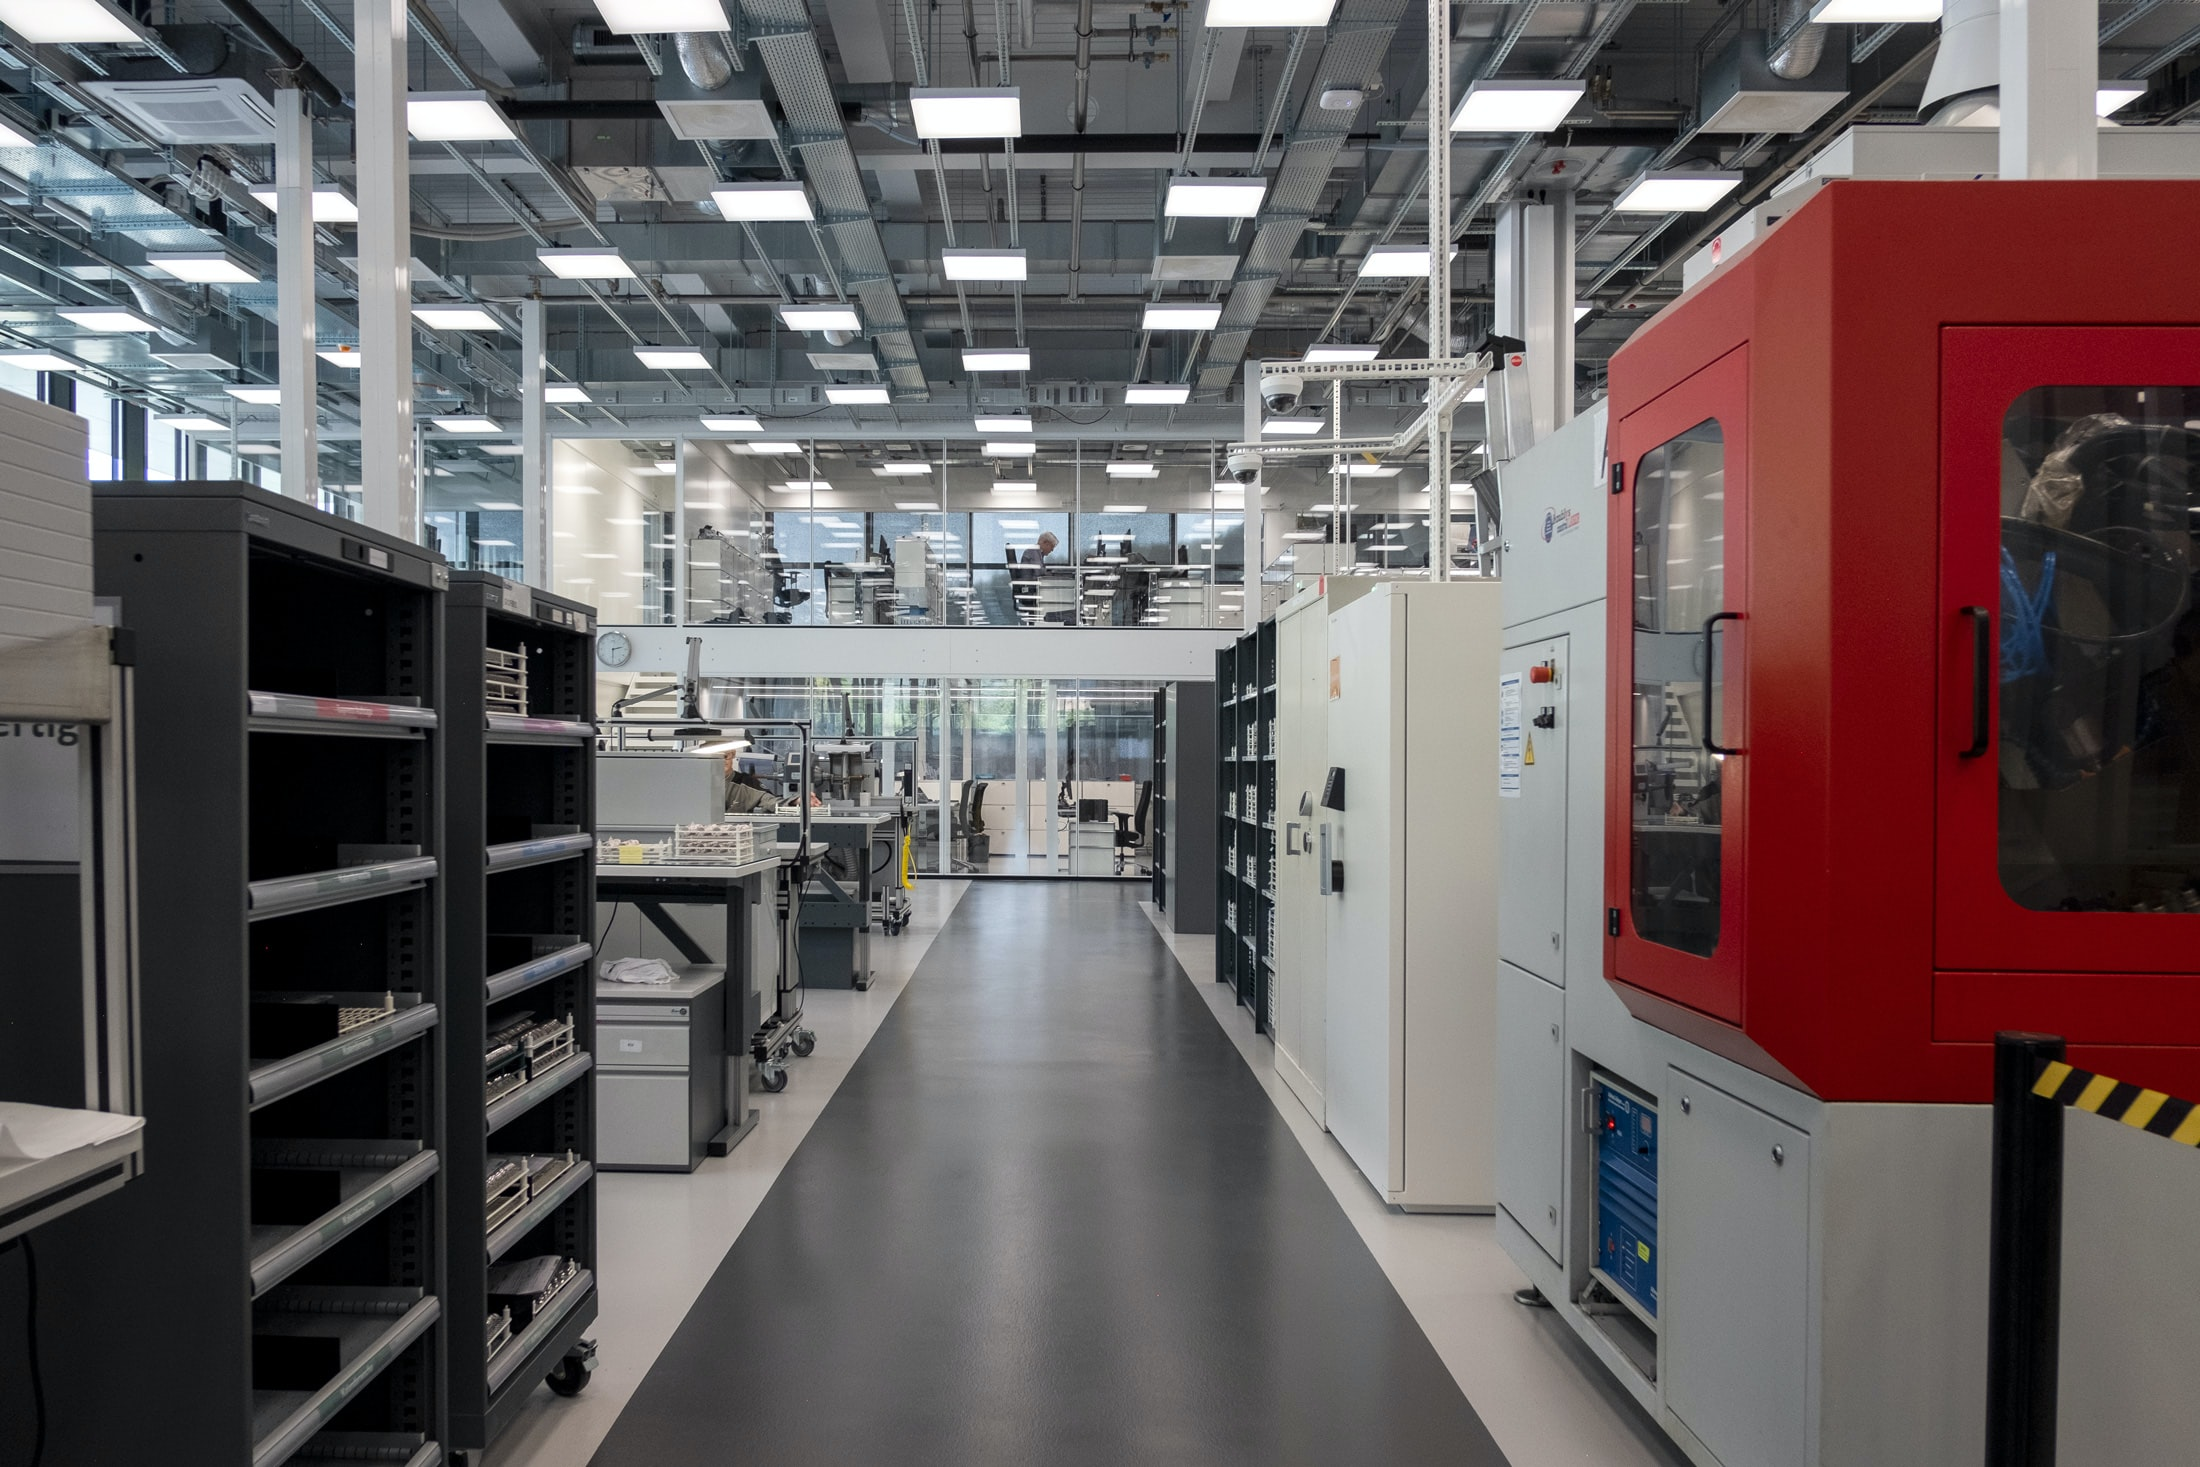 Inside The Manufacture: The New IWC Manufakturzentrum DSCF9370